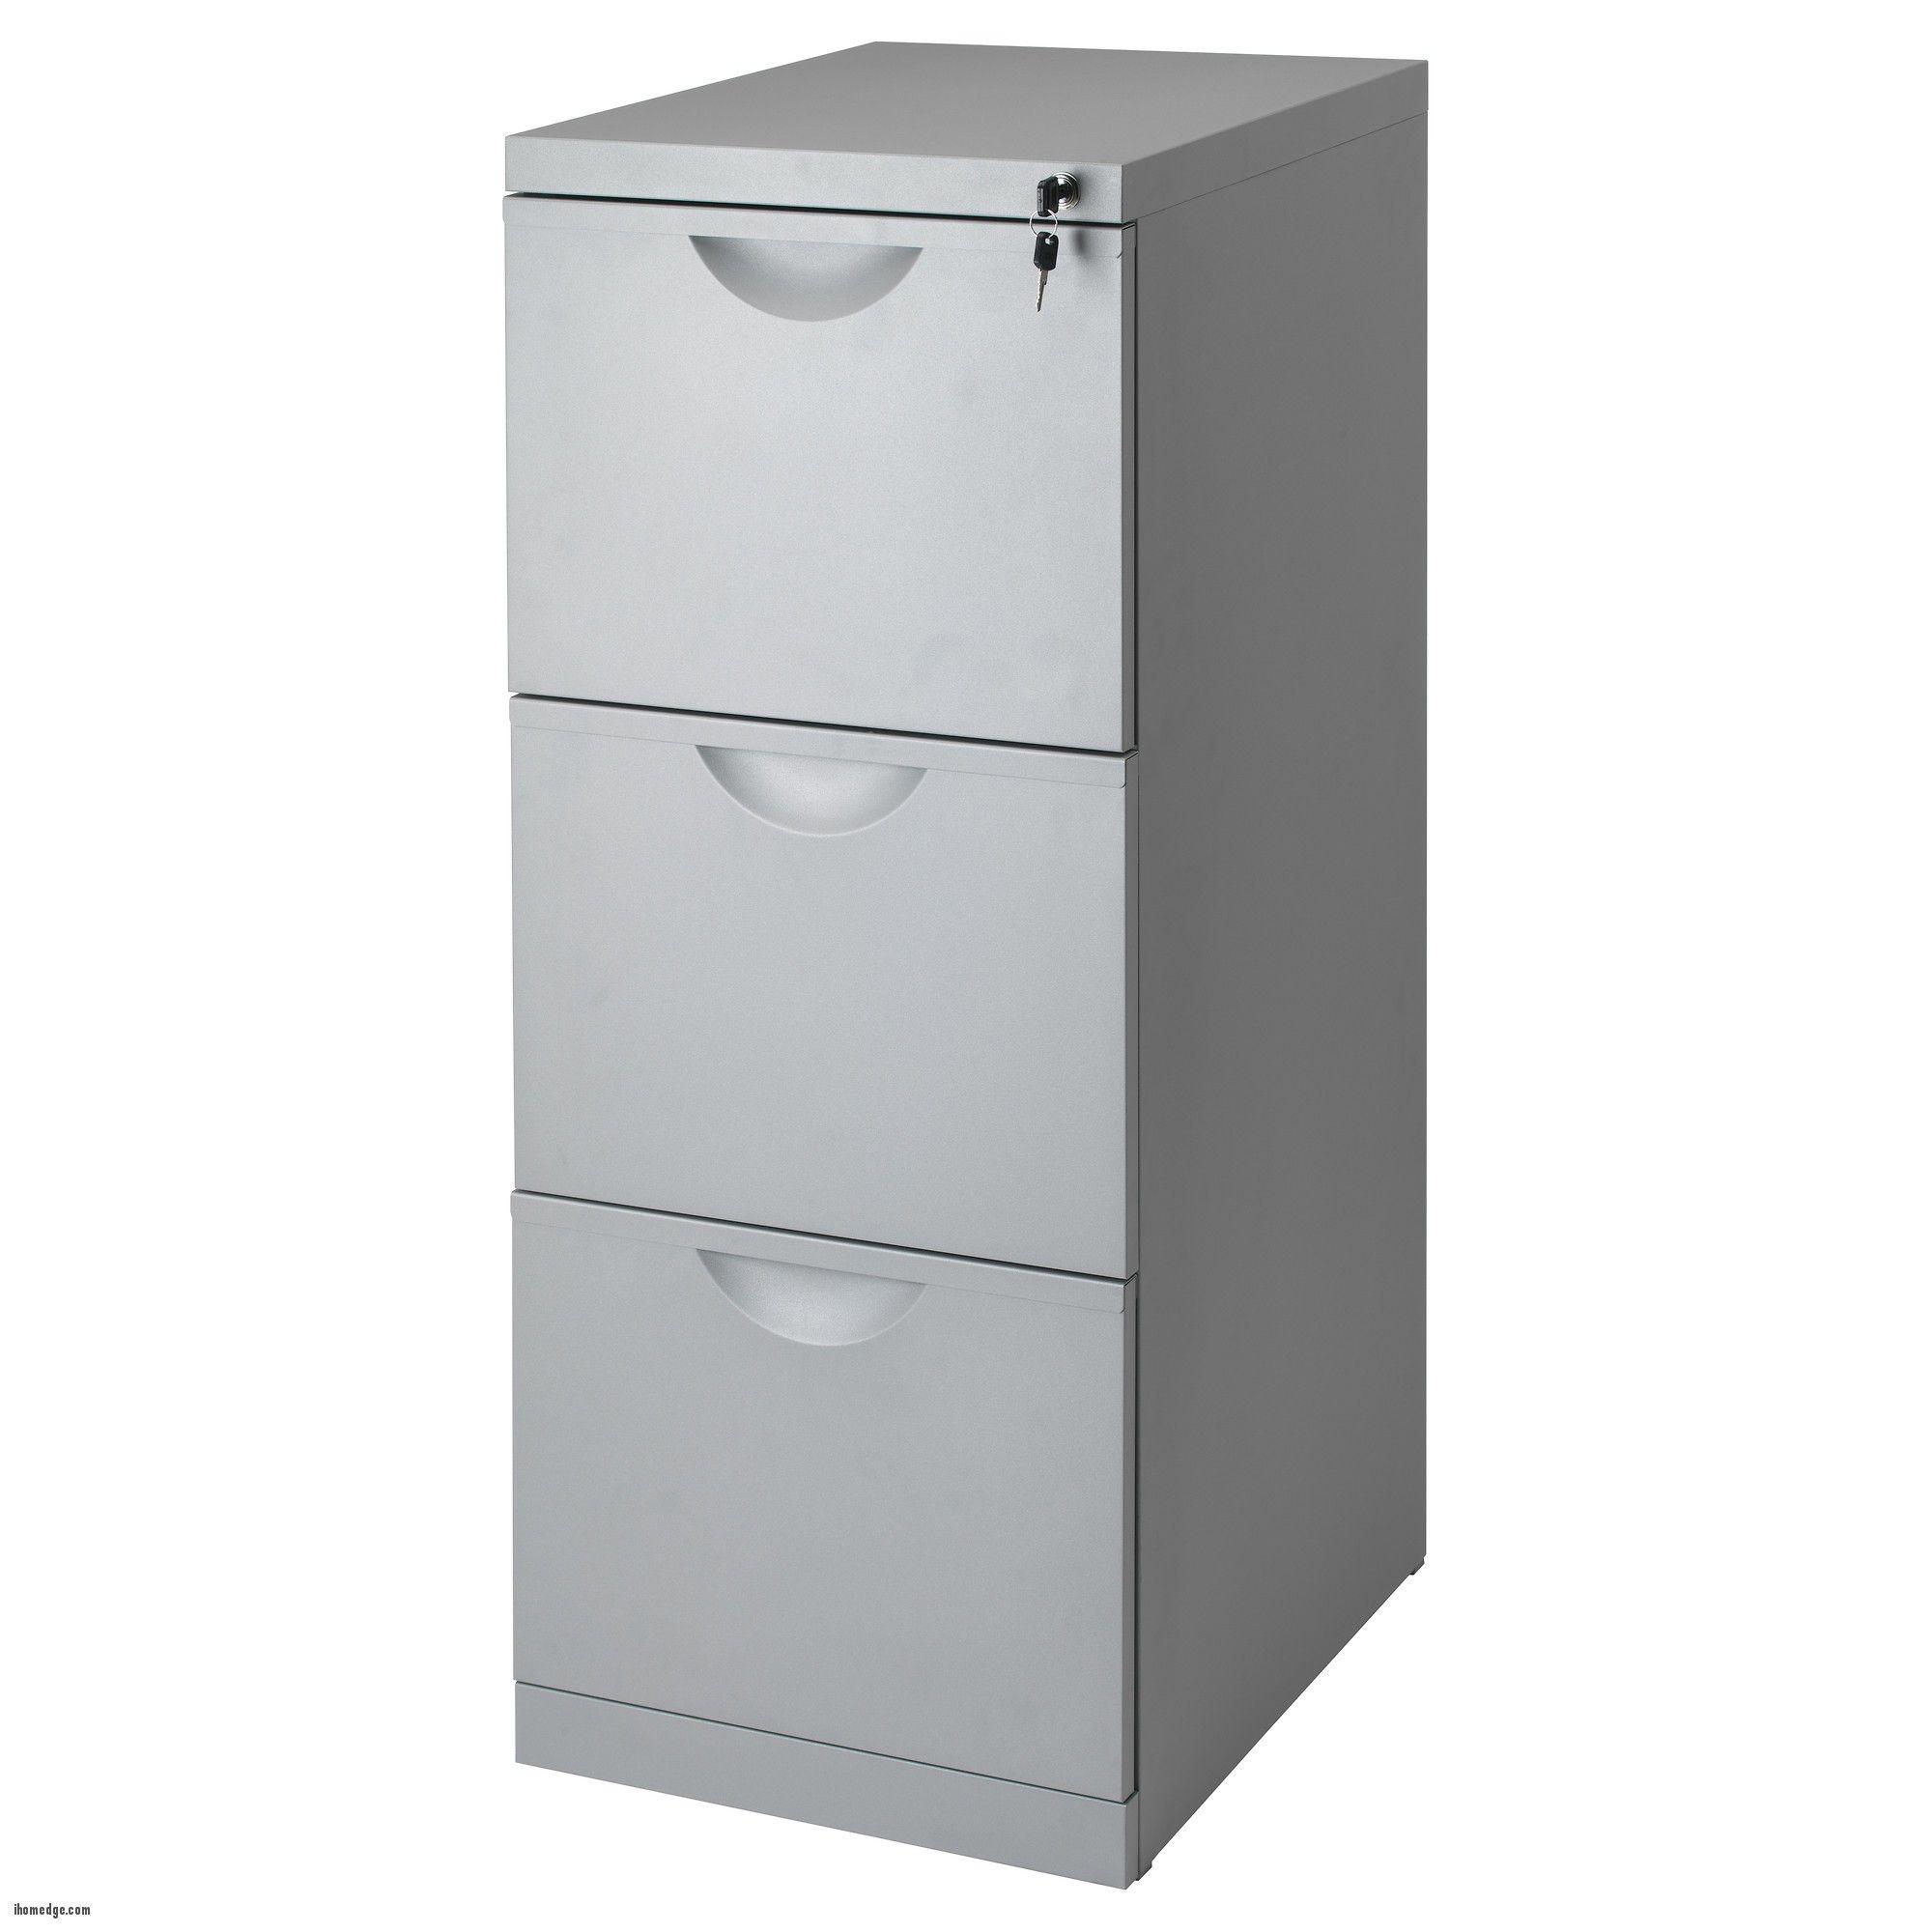 Inspirational New Metal Filing Cabinet Full Image for 2 Drawer